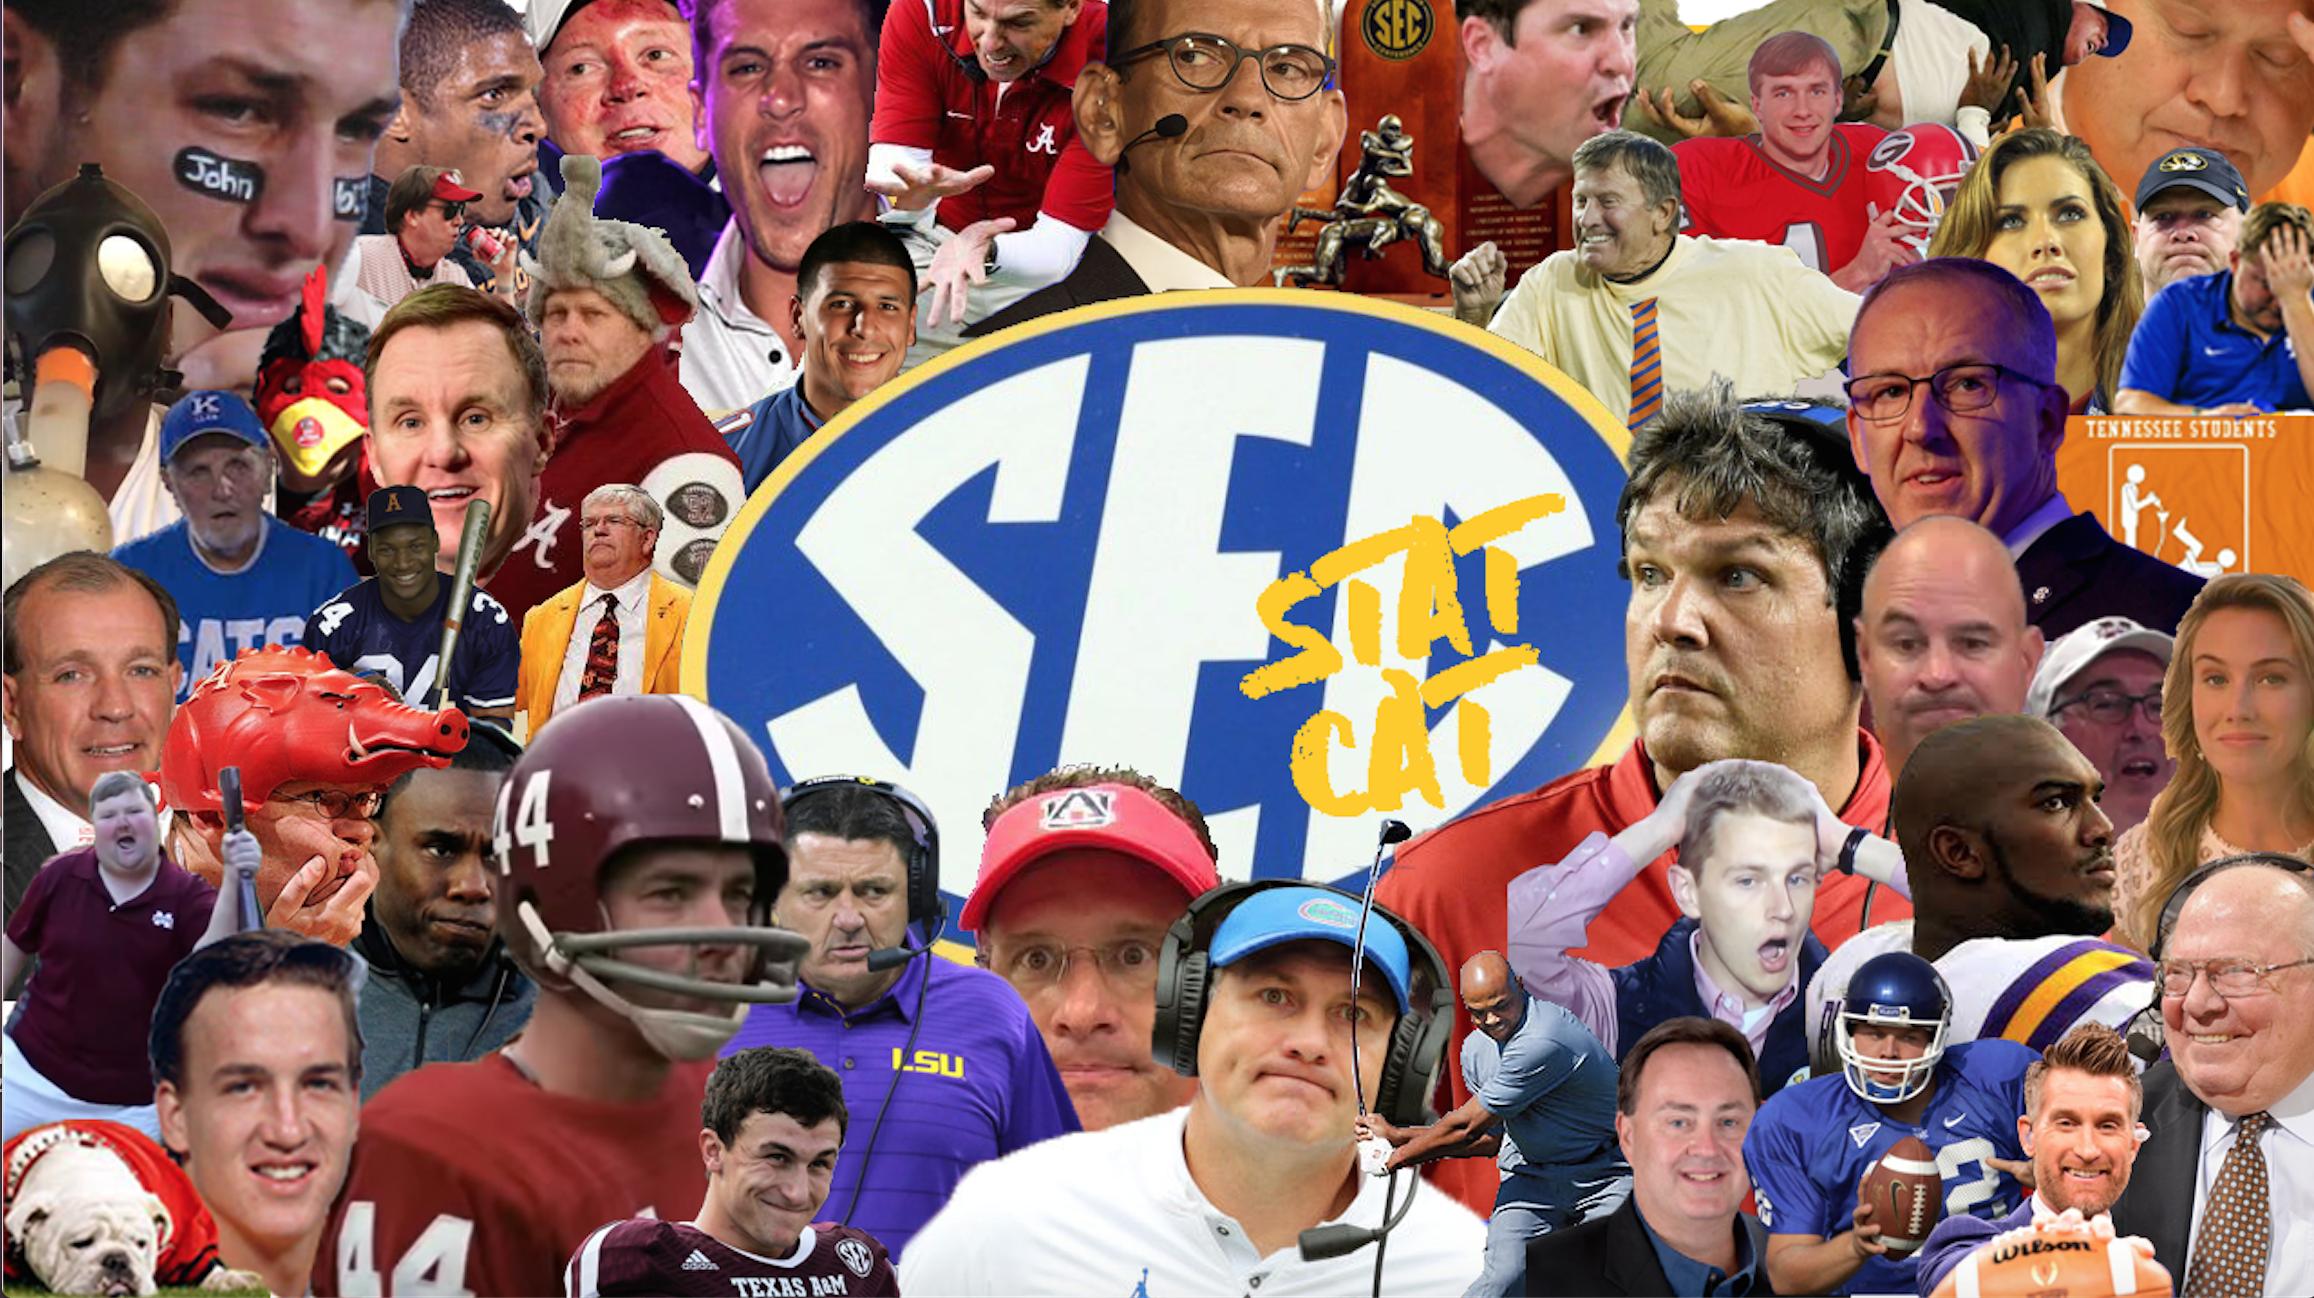 2019 SEC Statcast: Week 0